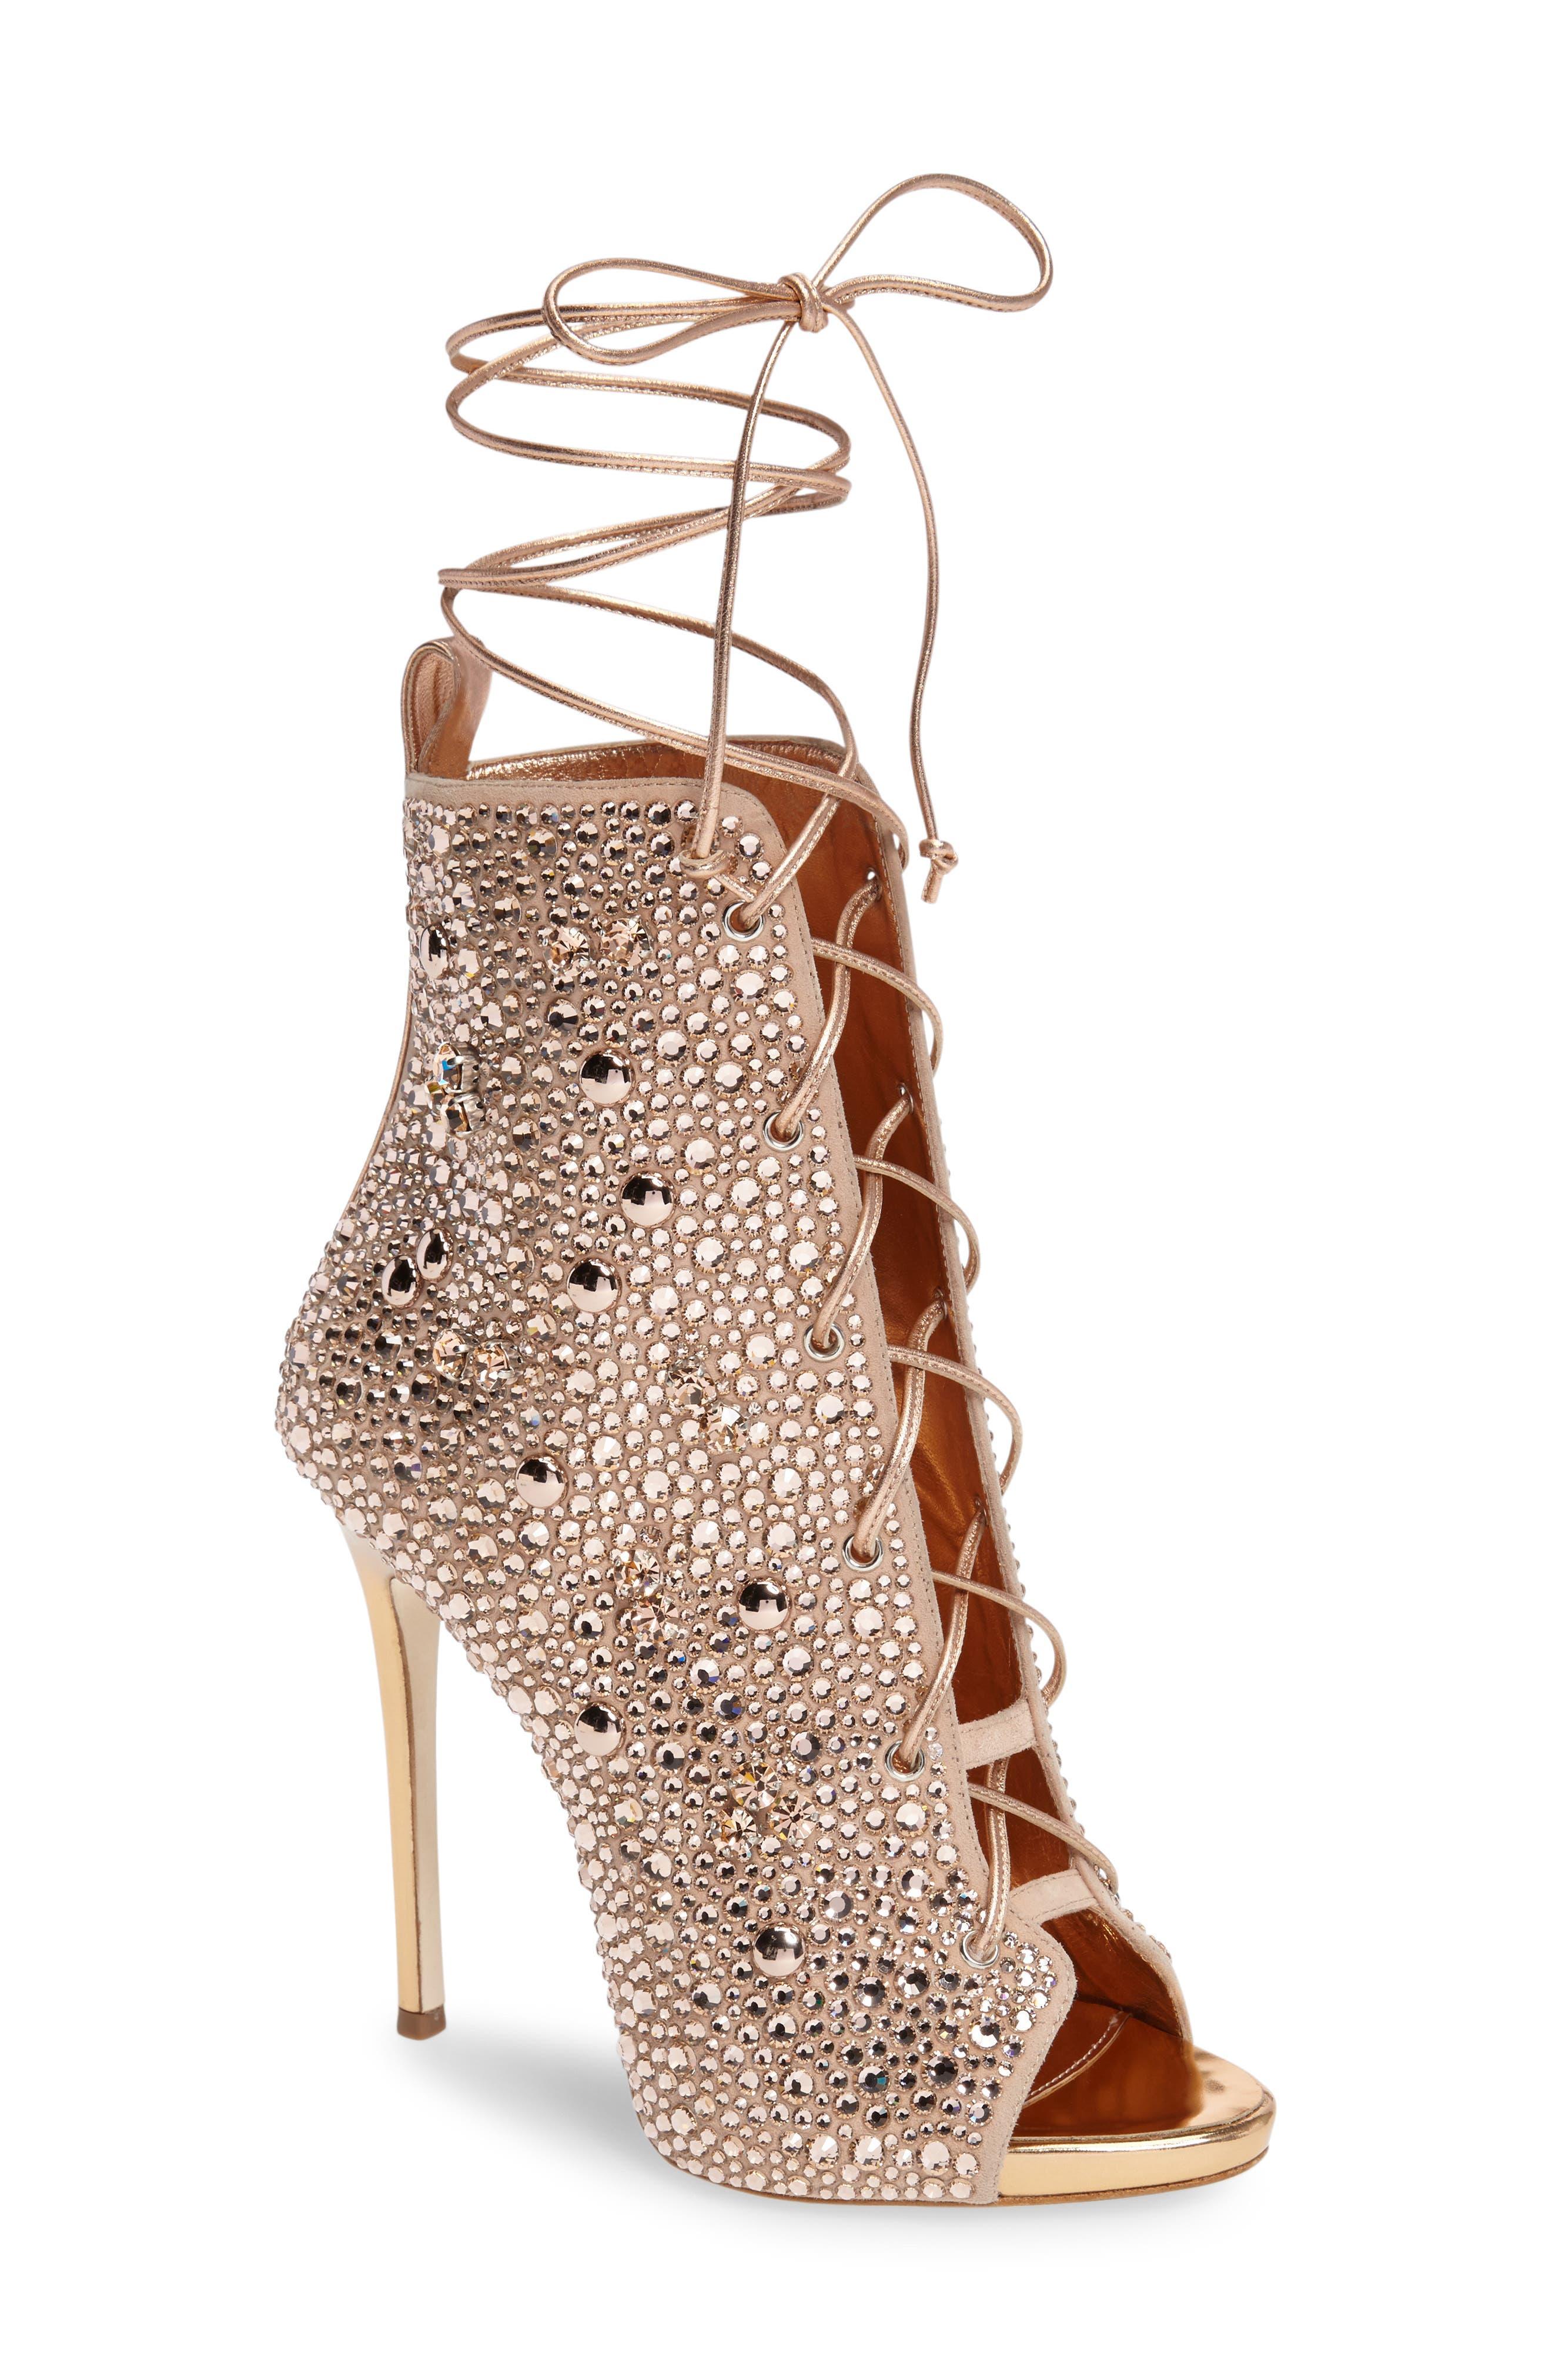 Giuseppe for Jennifer Lopez Lynda Embellished Lace-Up Sandal,                             Main thumbnail 1, color,                             710